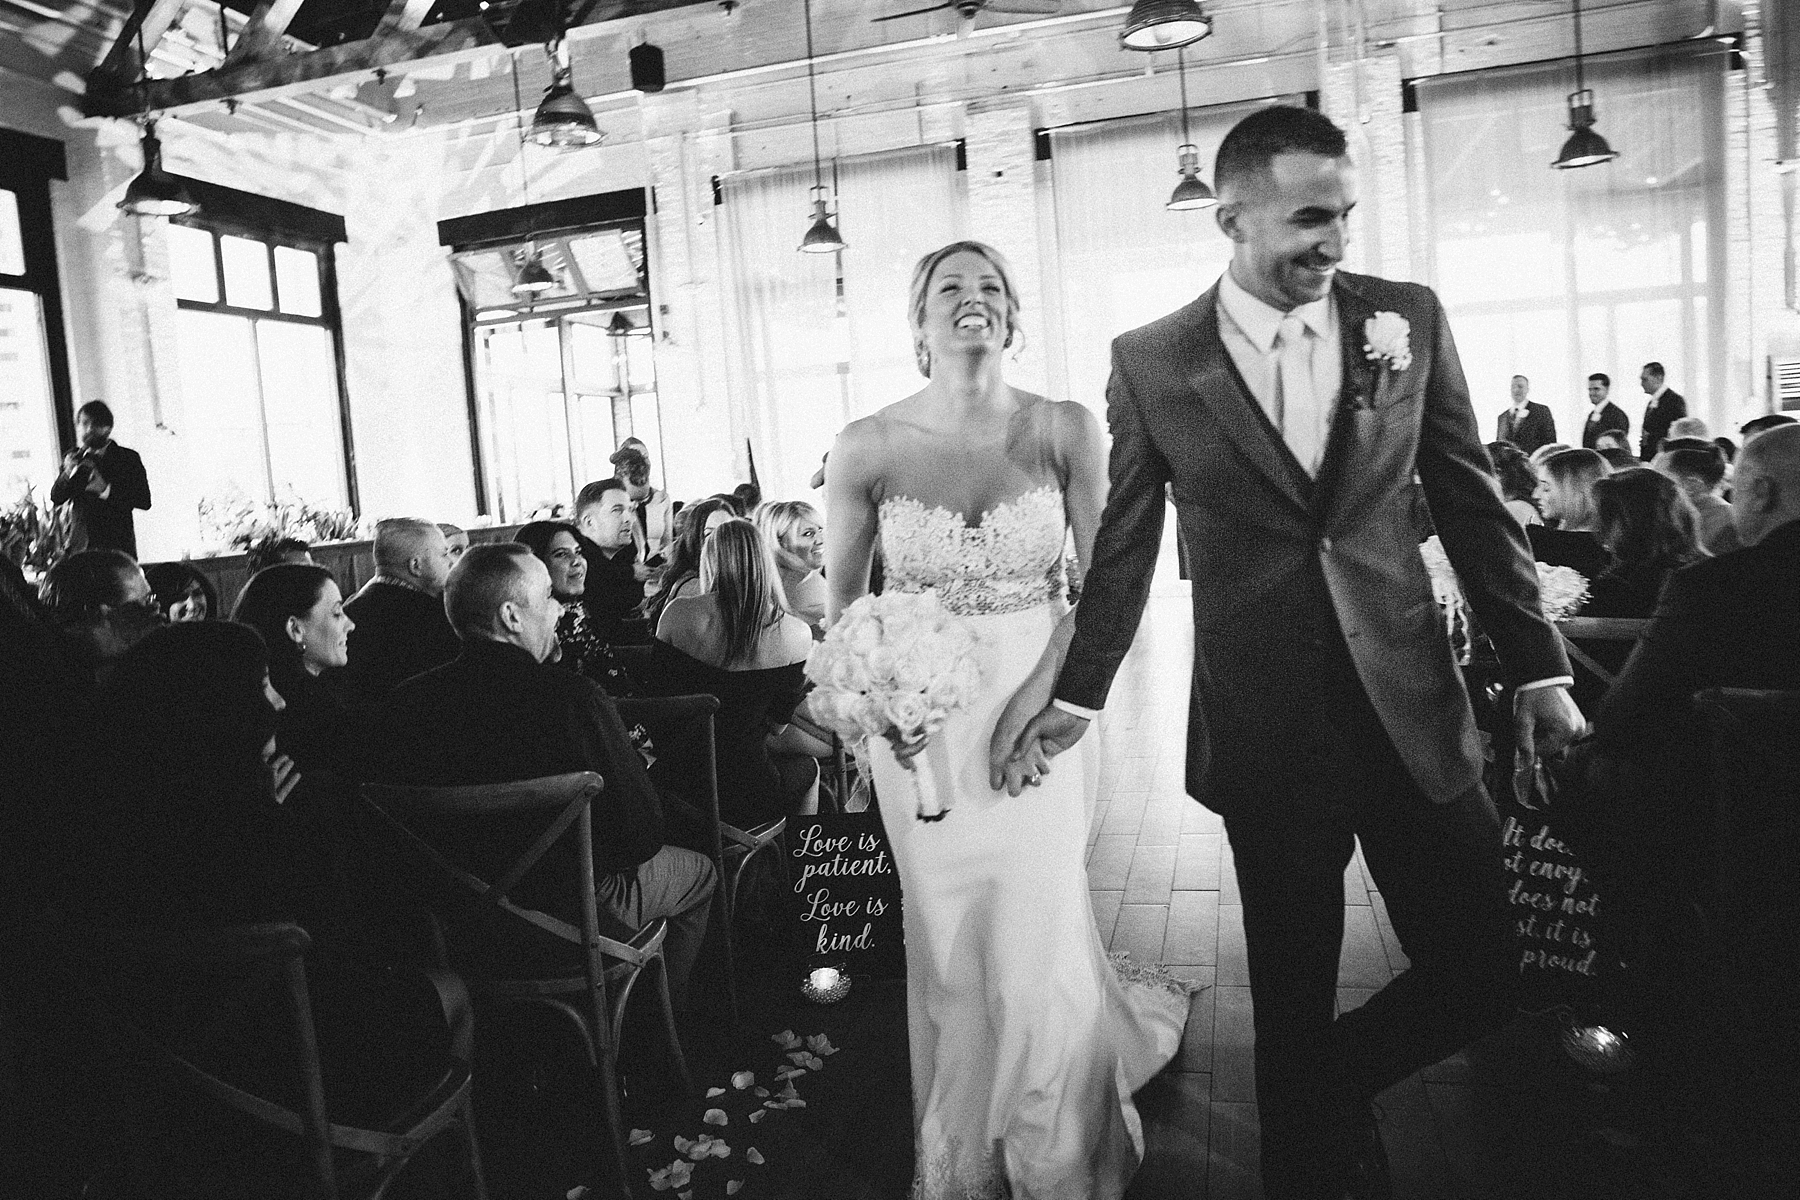 jersey-city-nj-wedding-photographer-top_0029.jpg